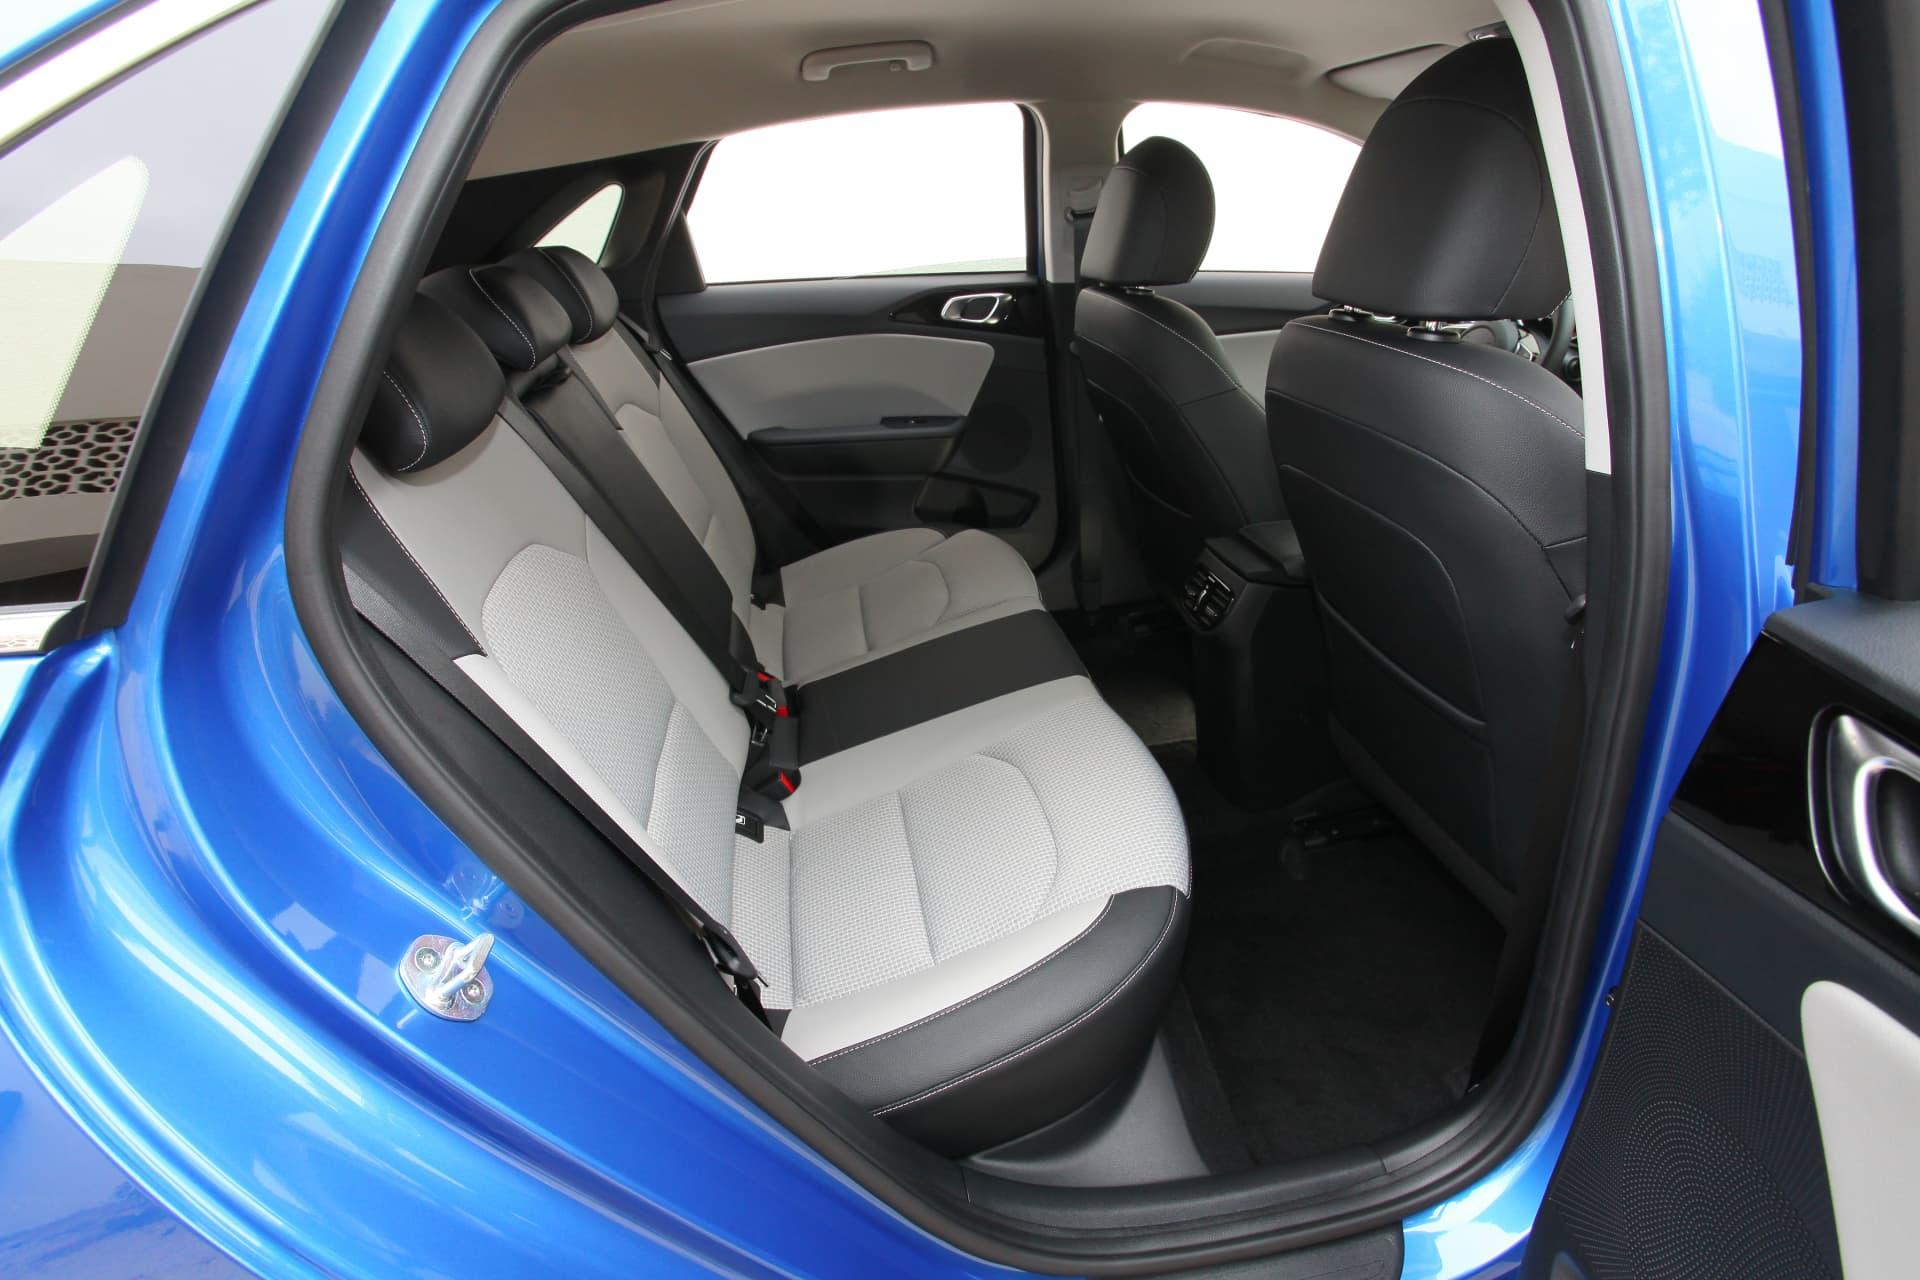 Kia Ceed 1 6 Crdi 6mt Transmission 136hp Blue Flame 32